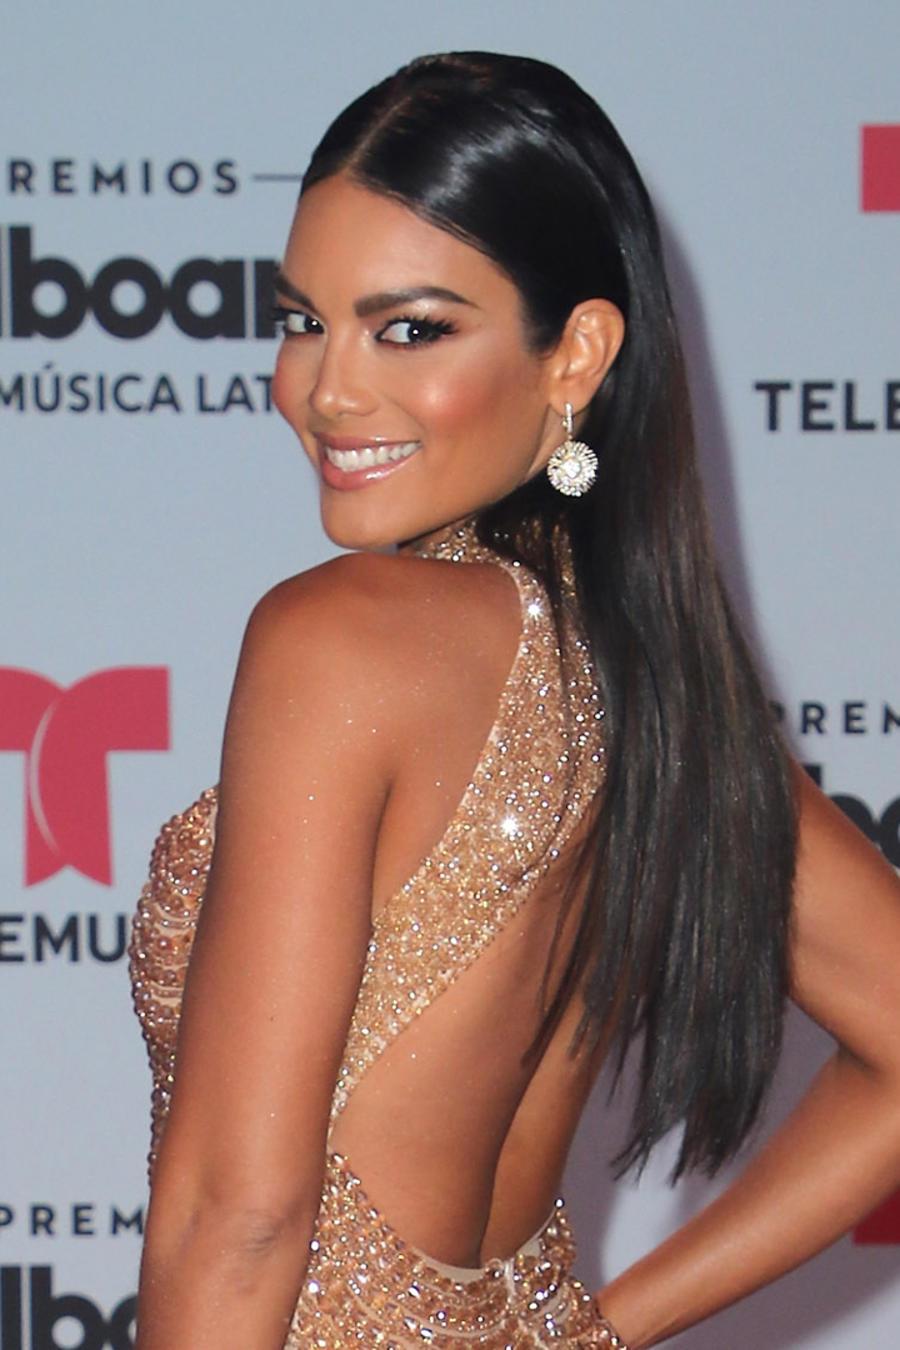 Zuleyka Rivera en la alfombra roja de Premios Billboard 2017